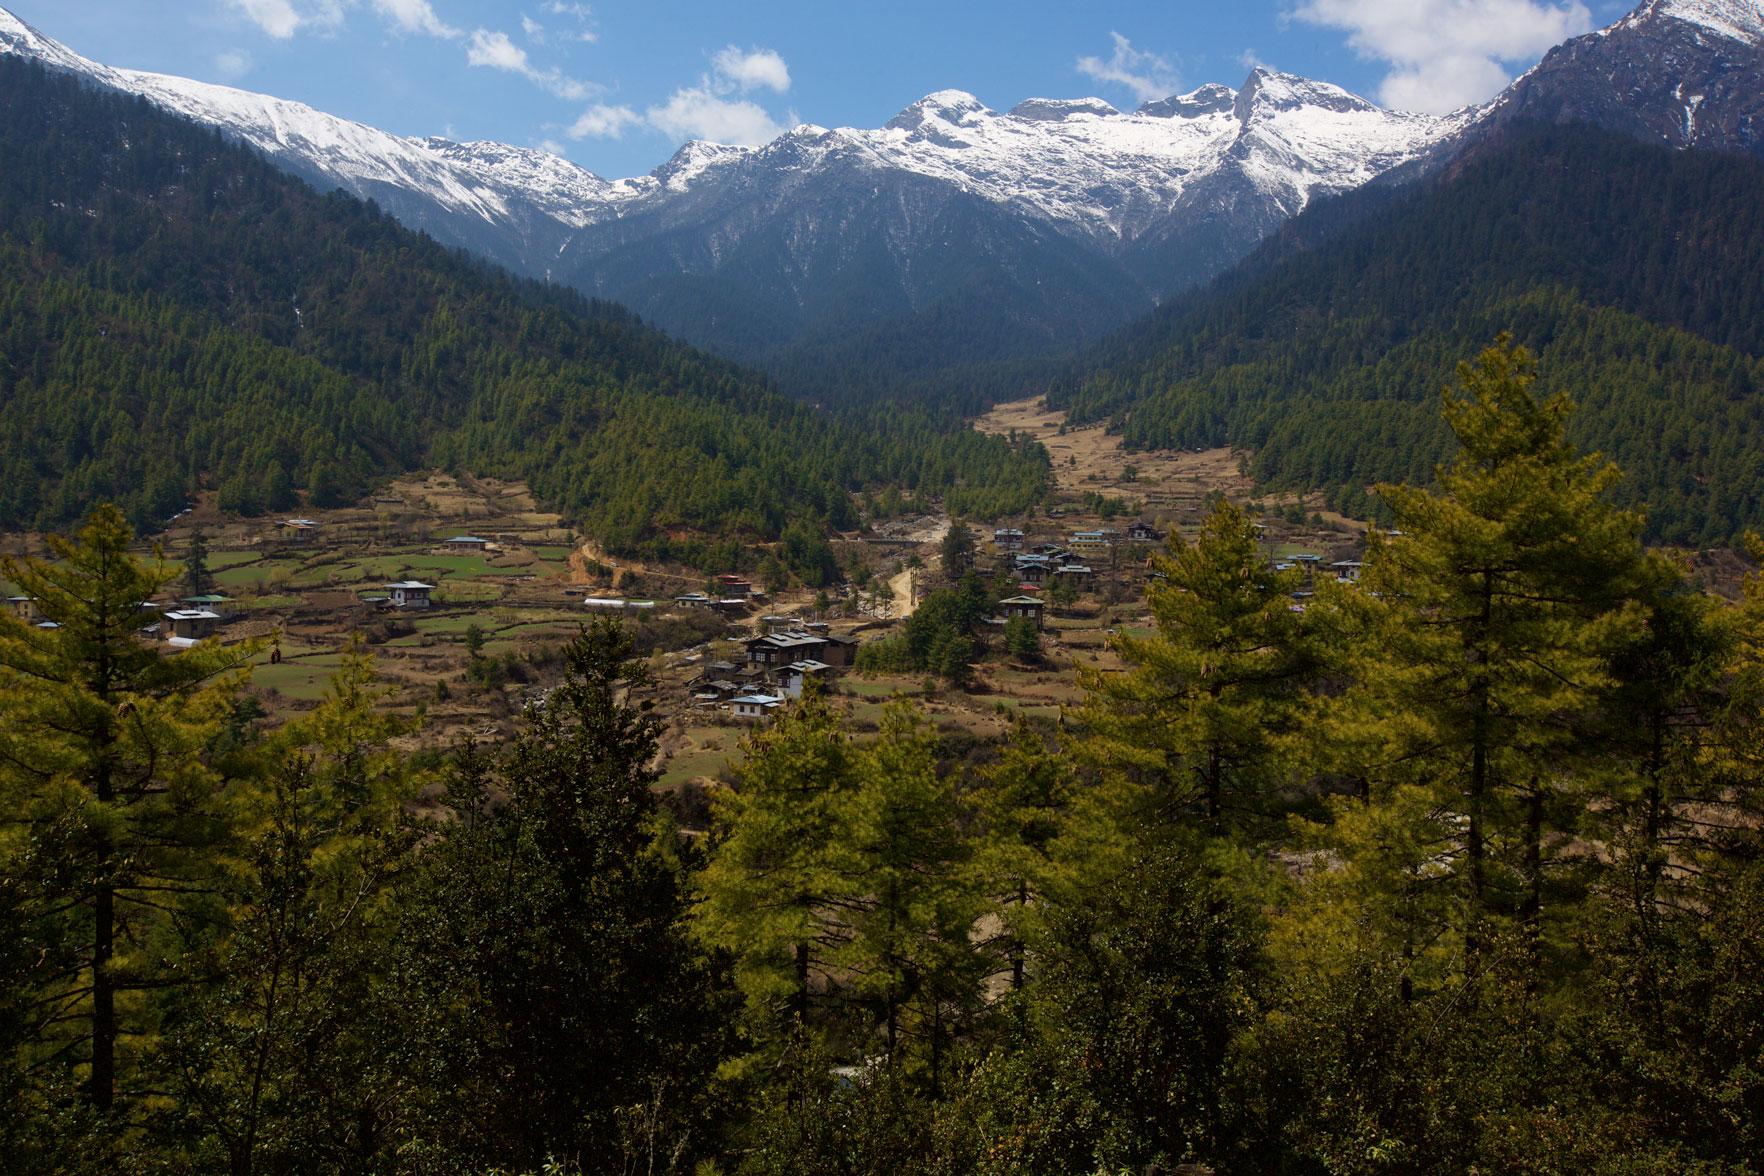 BTN_Sagala-Mountain-pass-trek-and-camp-©17-Thomas-Baechtold-468.jpg